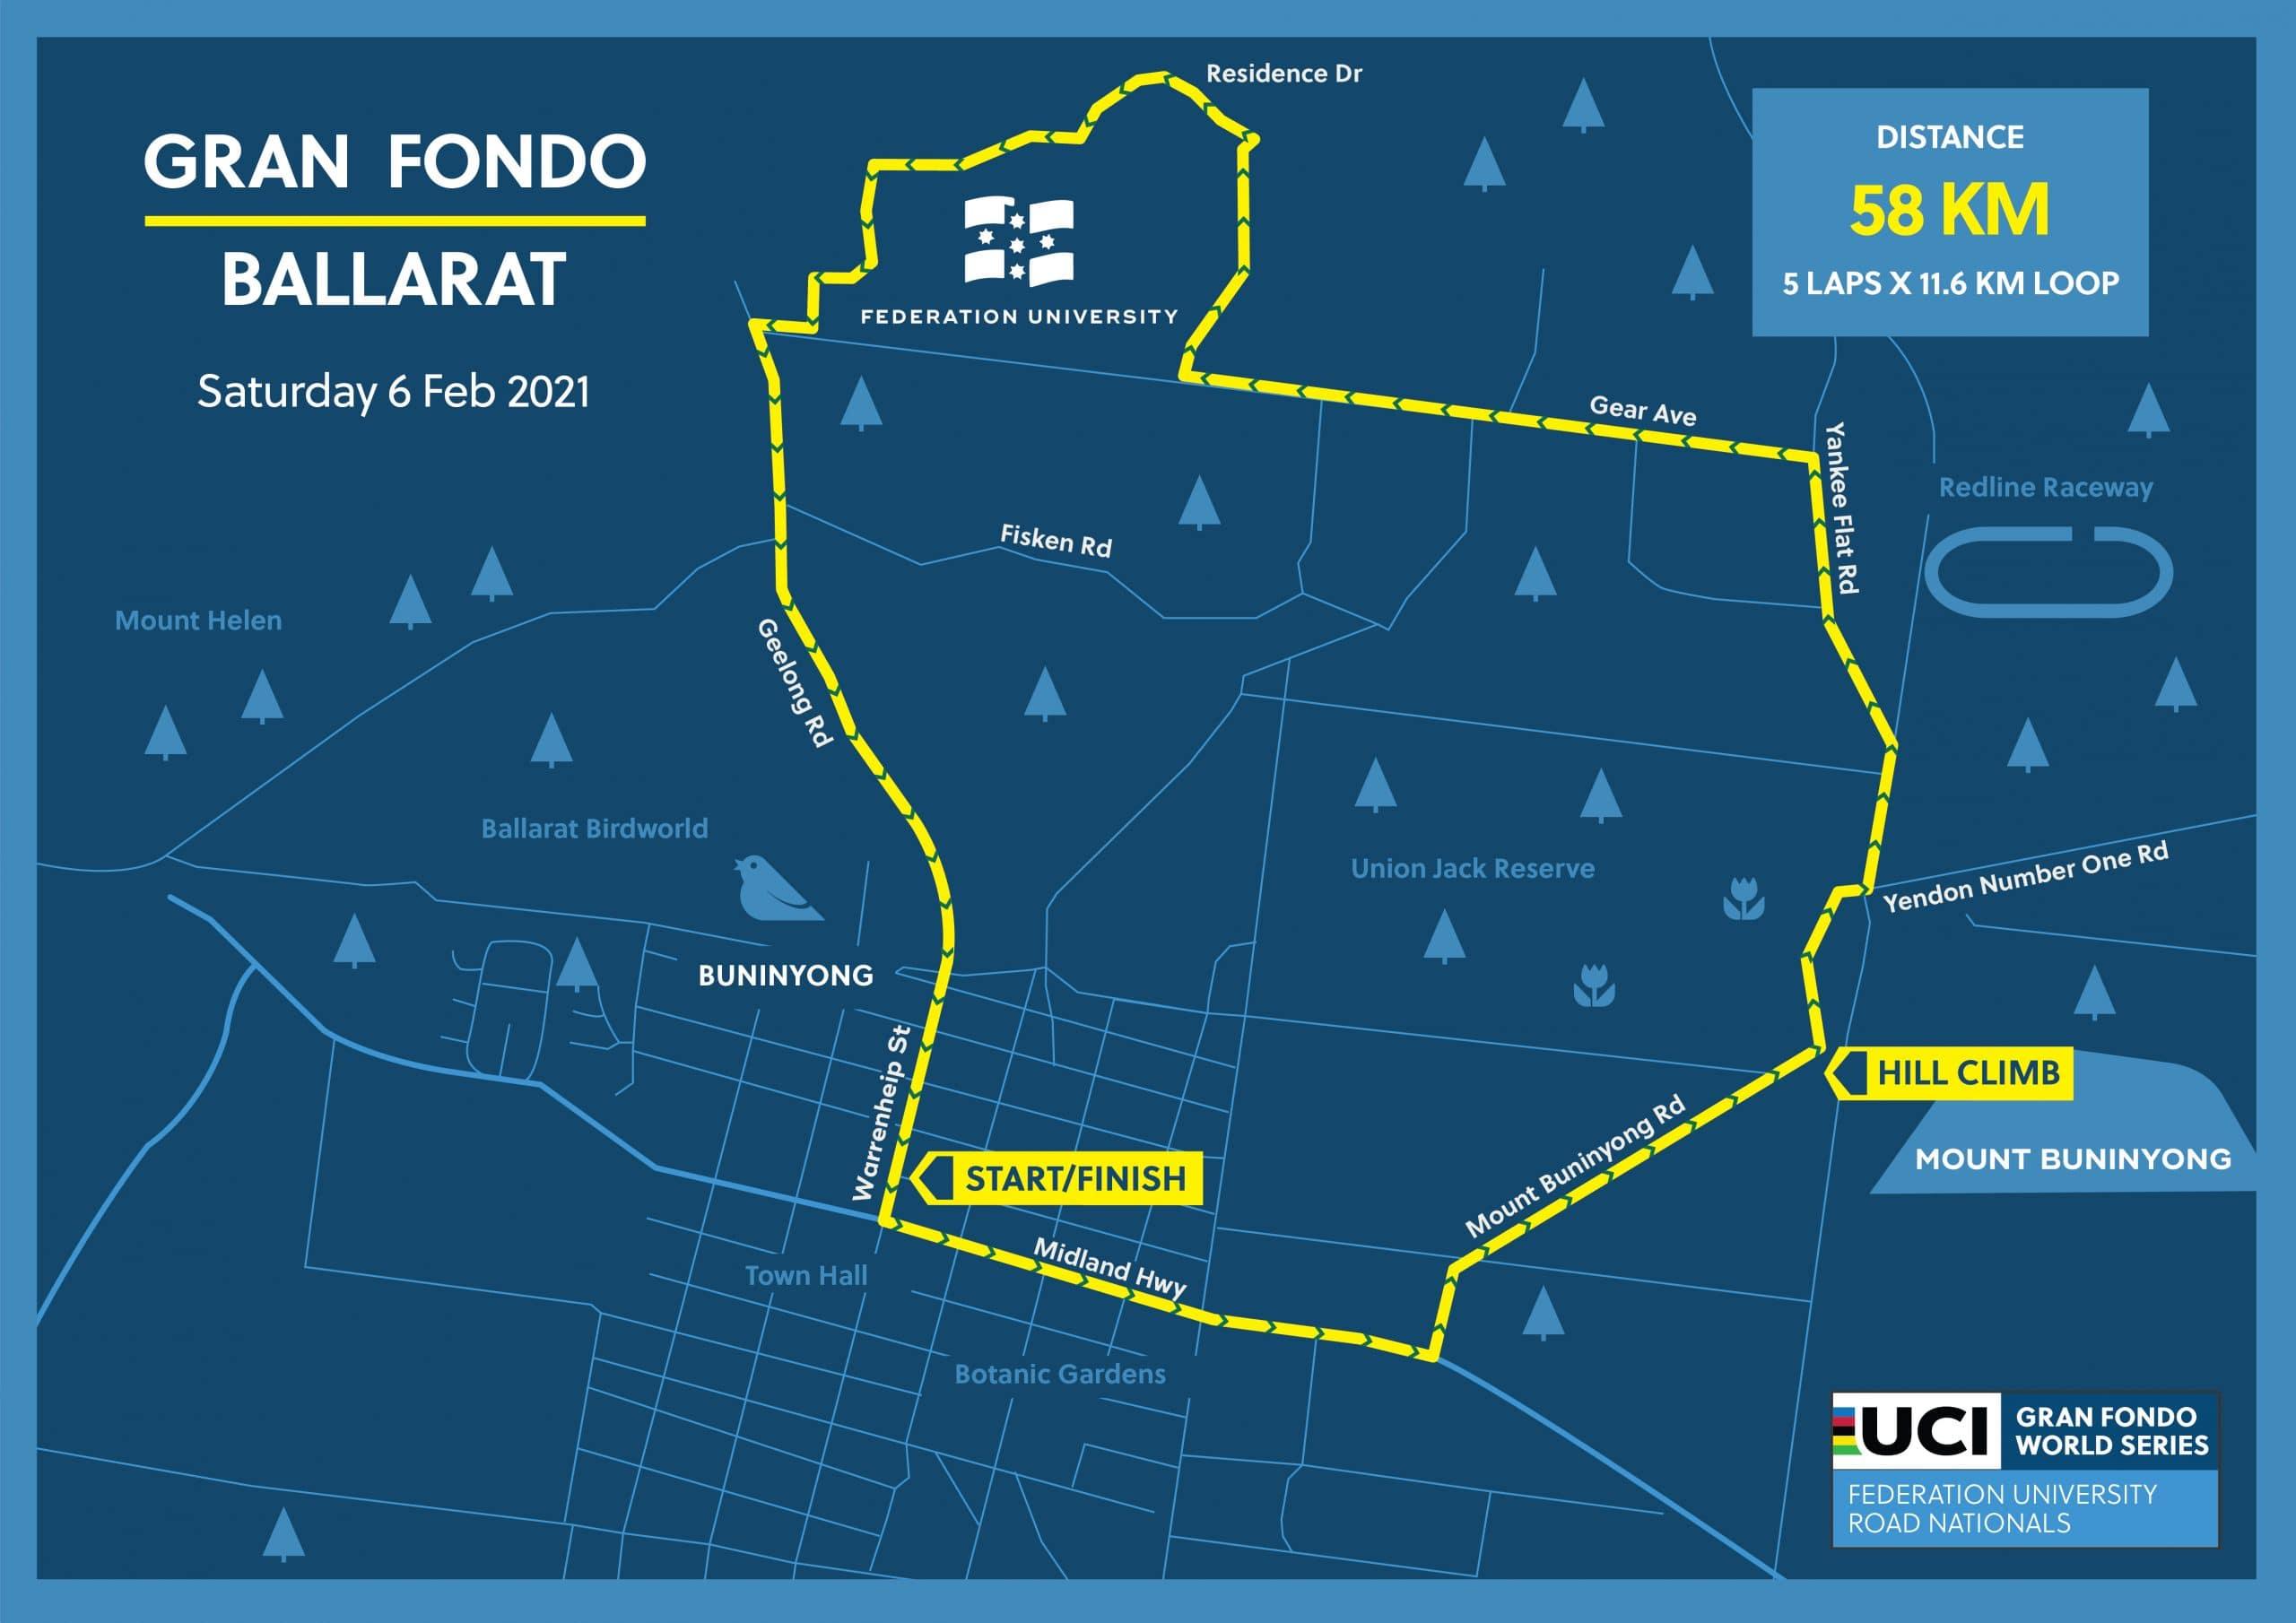 Gran Fondo Road Race Course Map